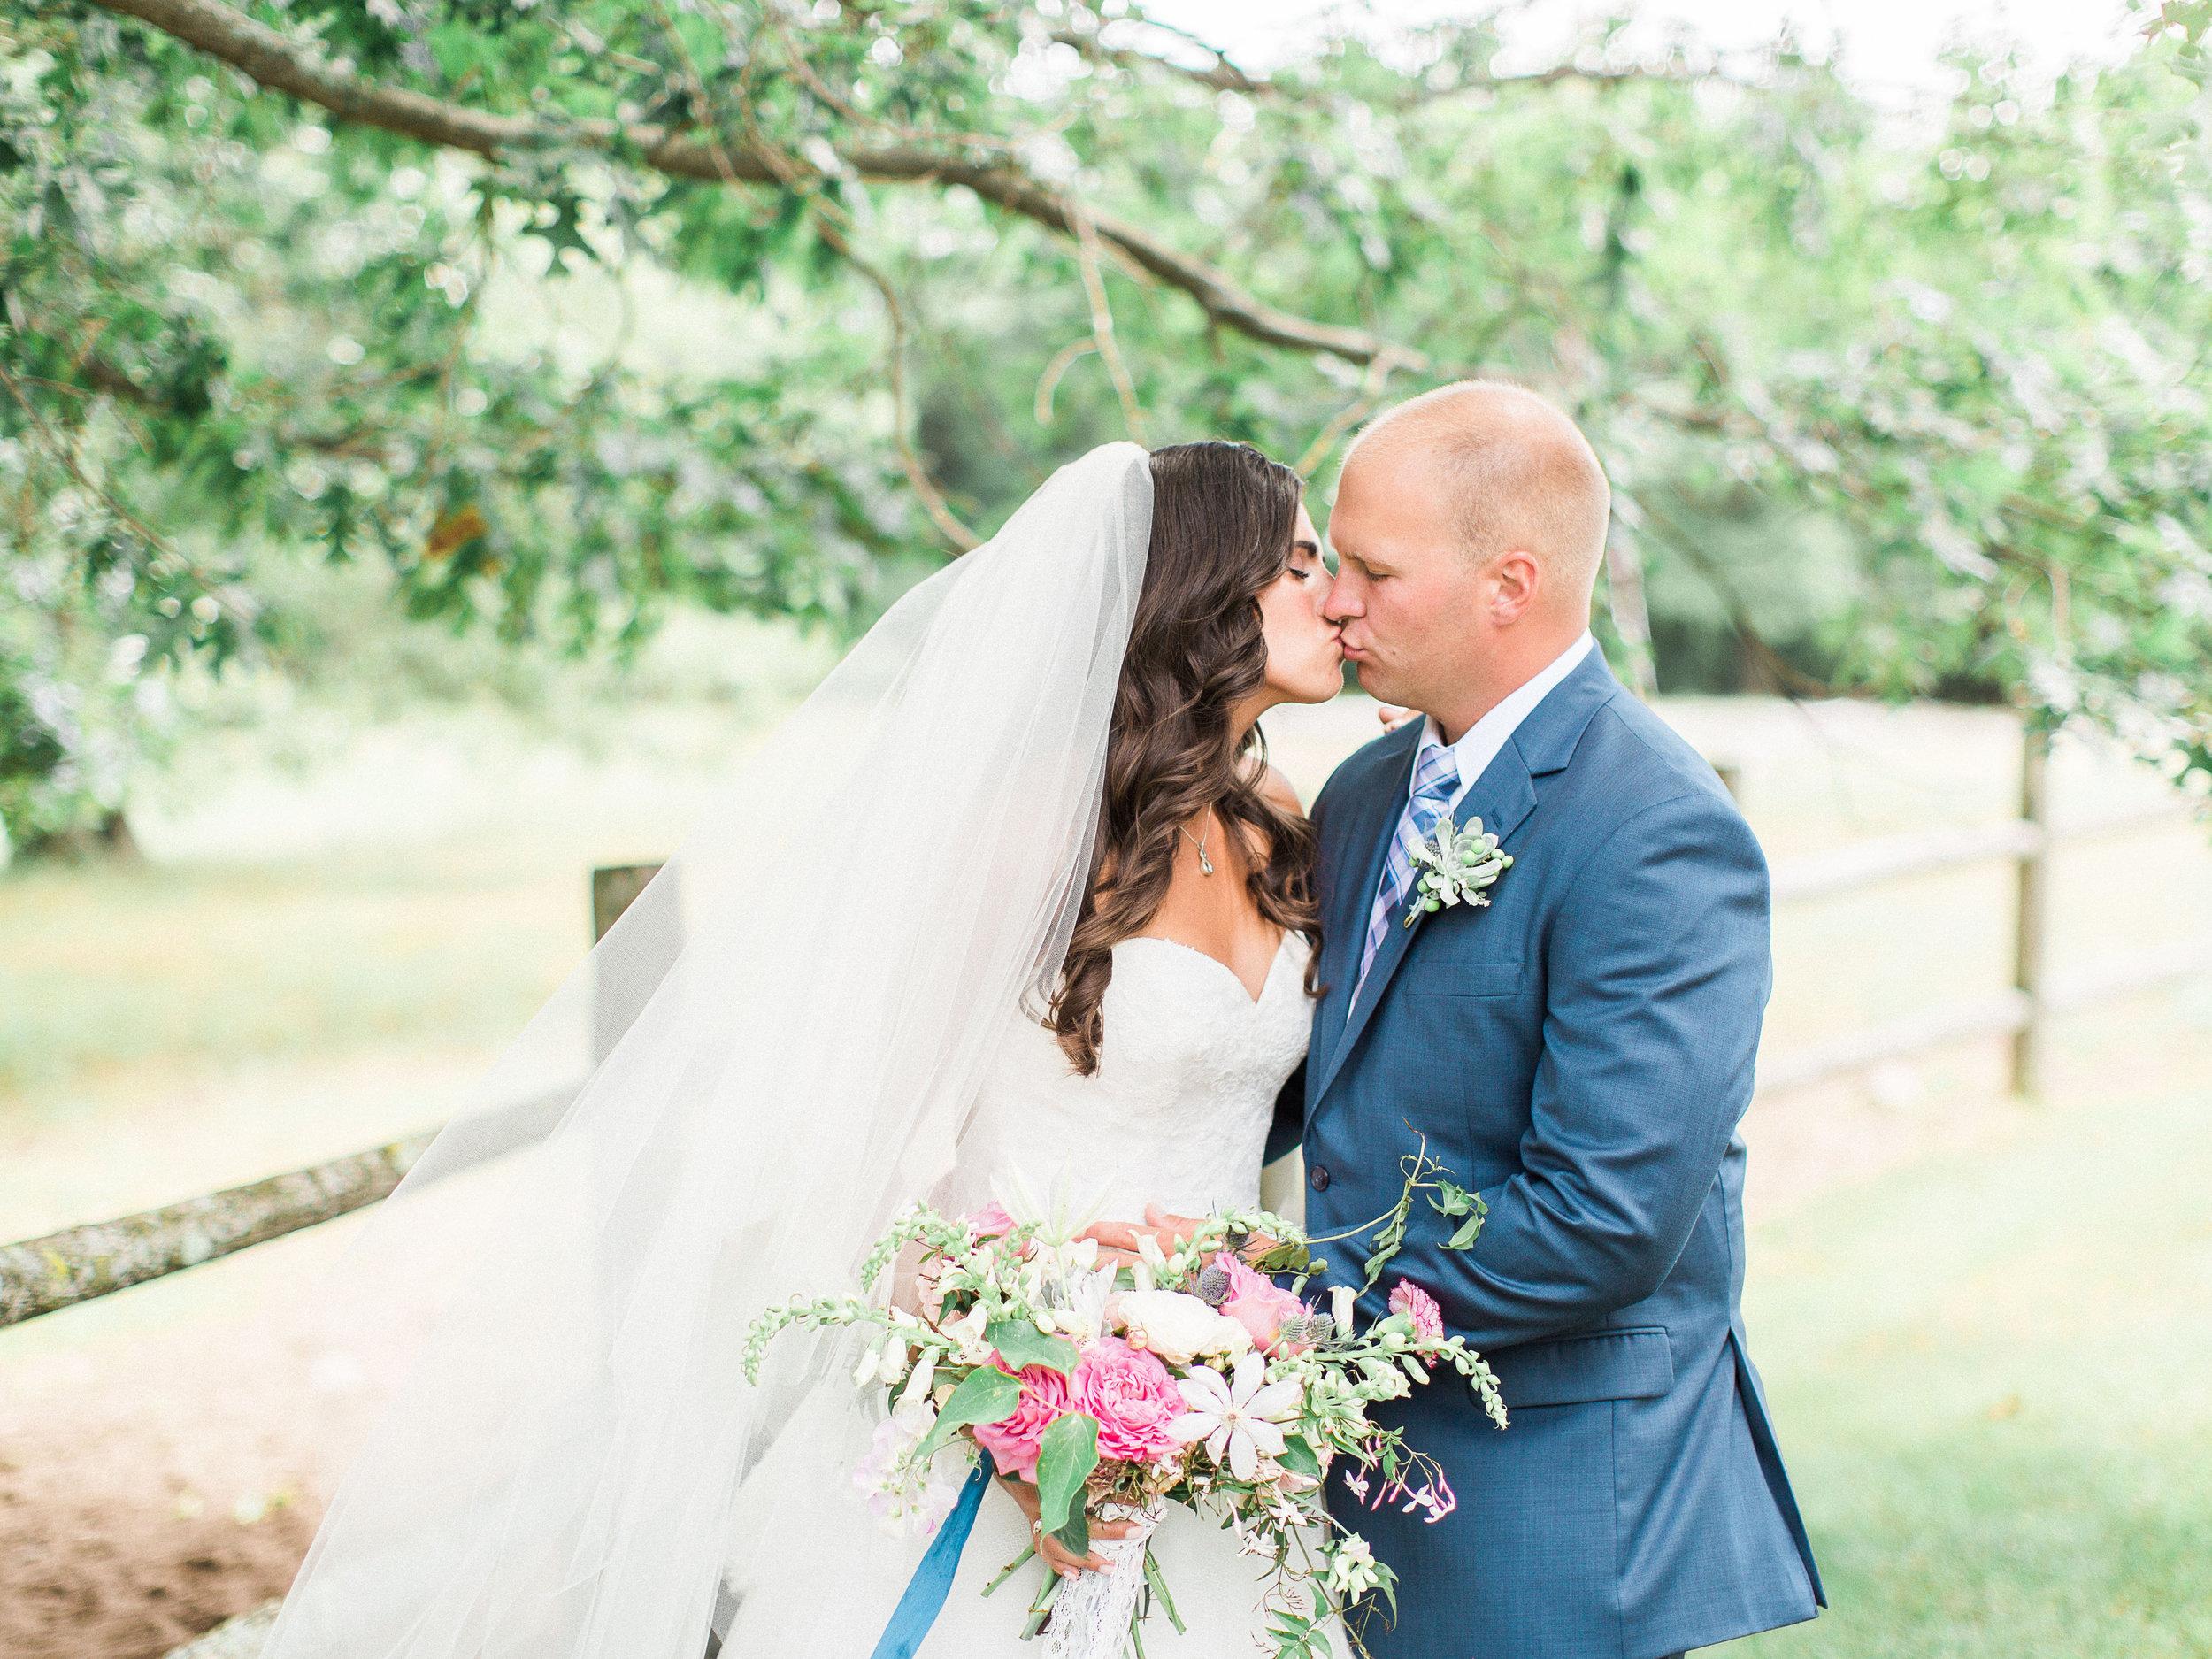 ERIC AND HALLIE WEDDING-HI RESOLUTION FOR PRINTING-0246.jpg